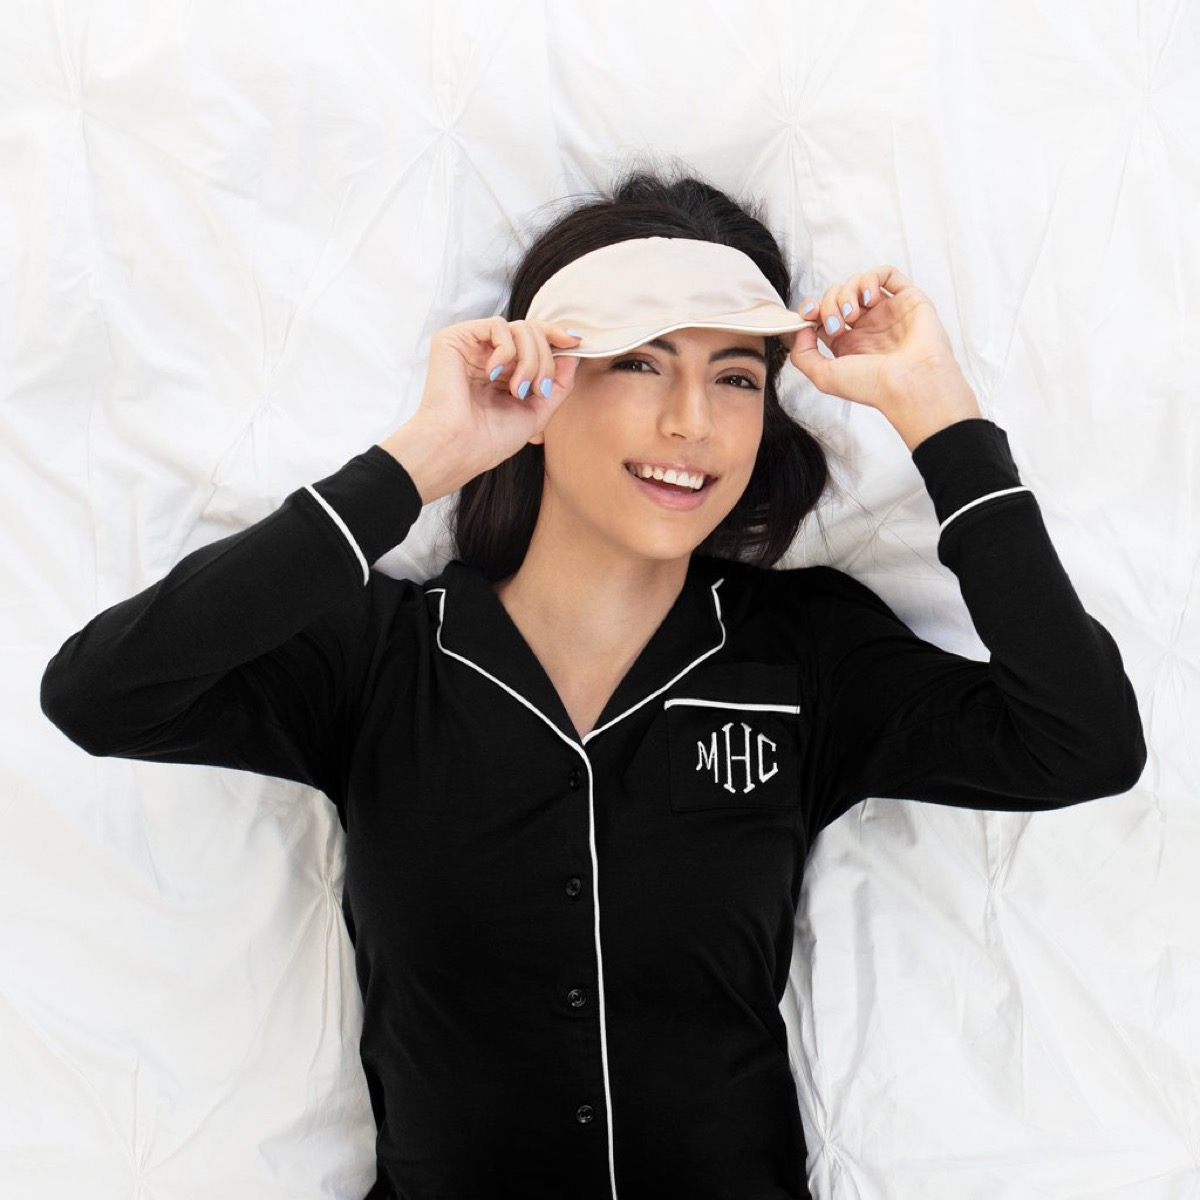 Woman wearing monogrammed pj's and sleep mask